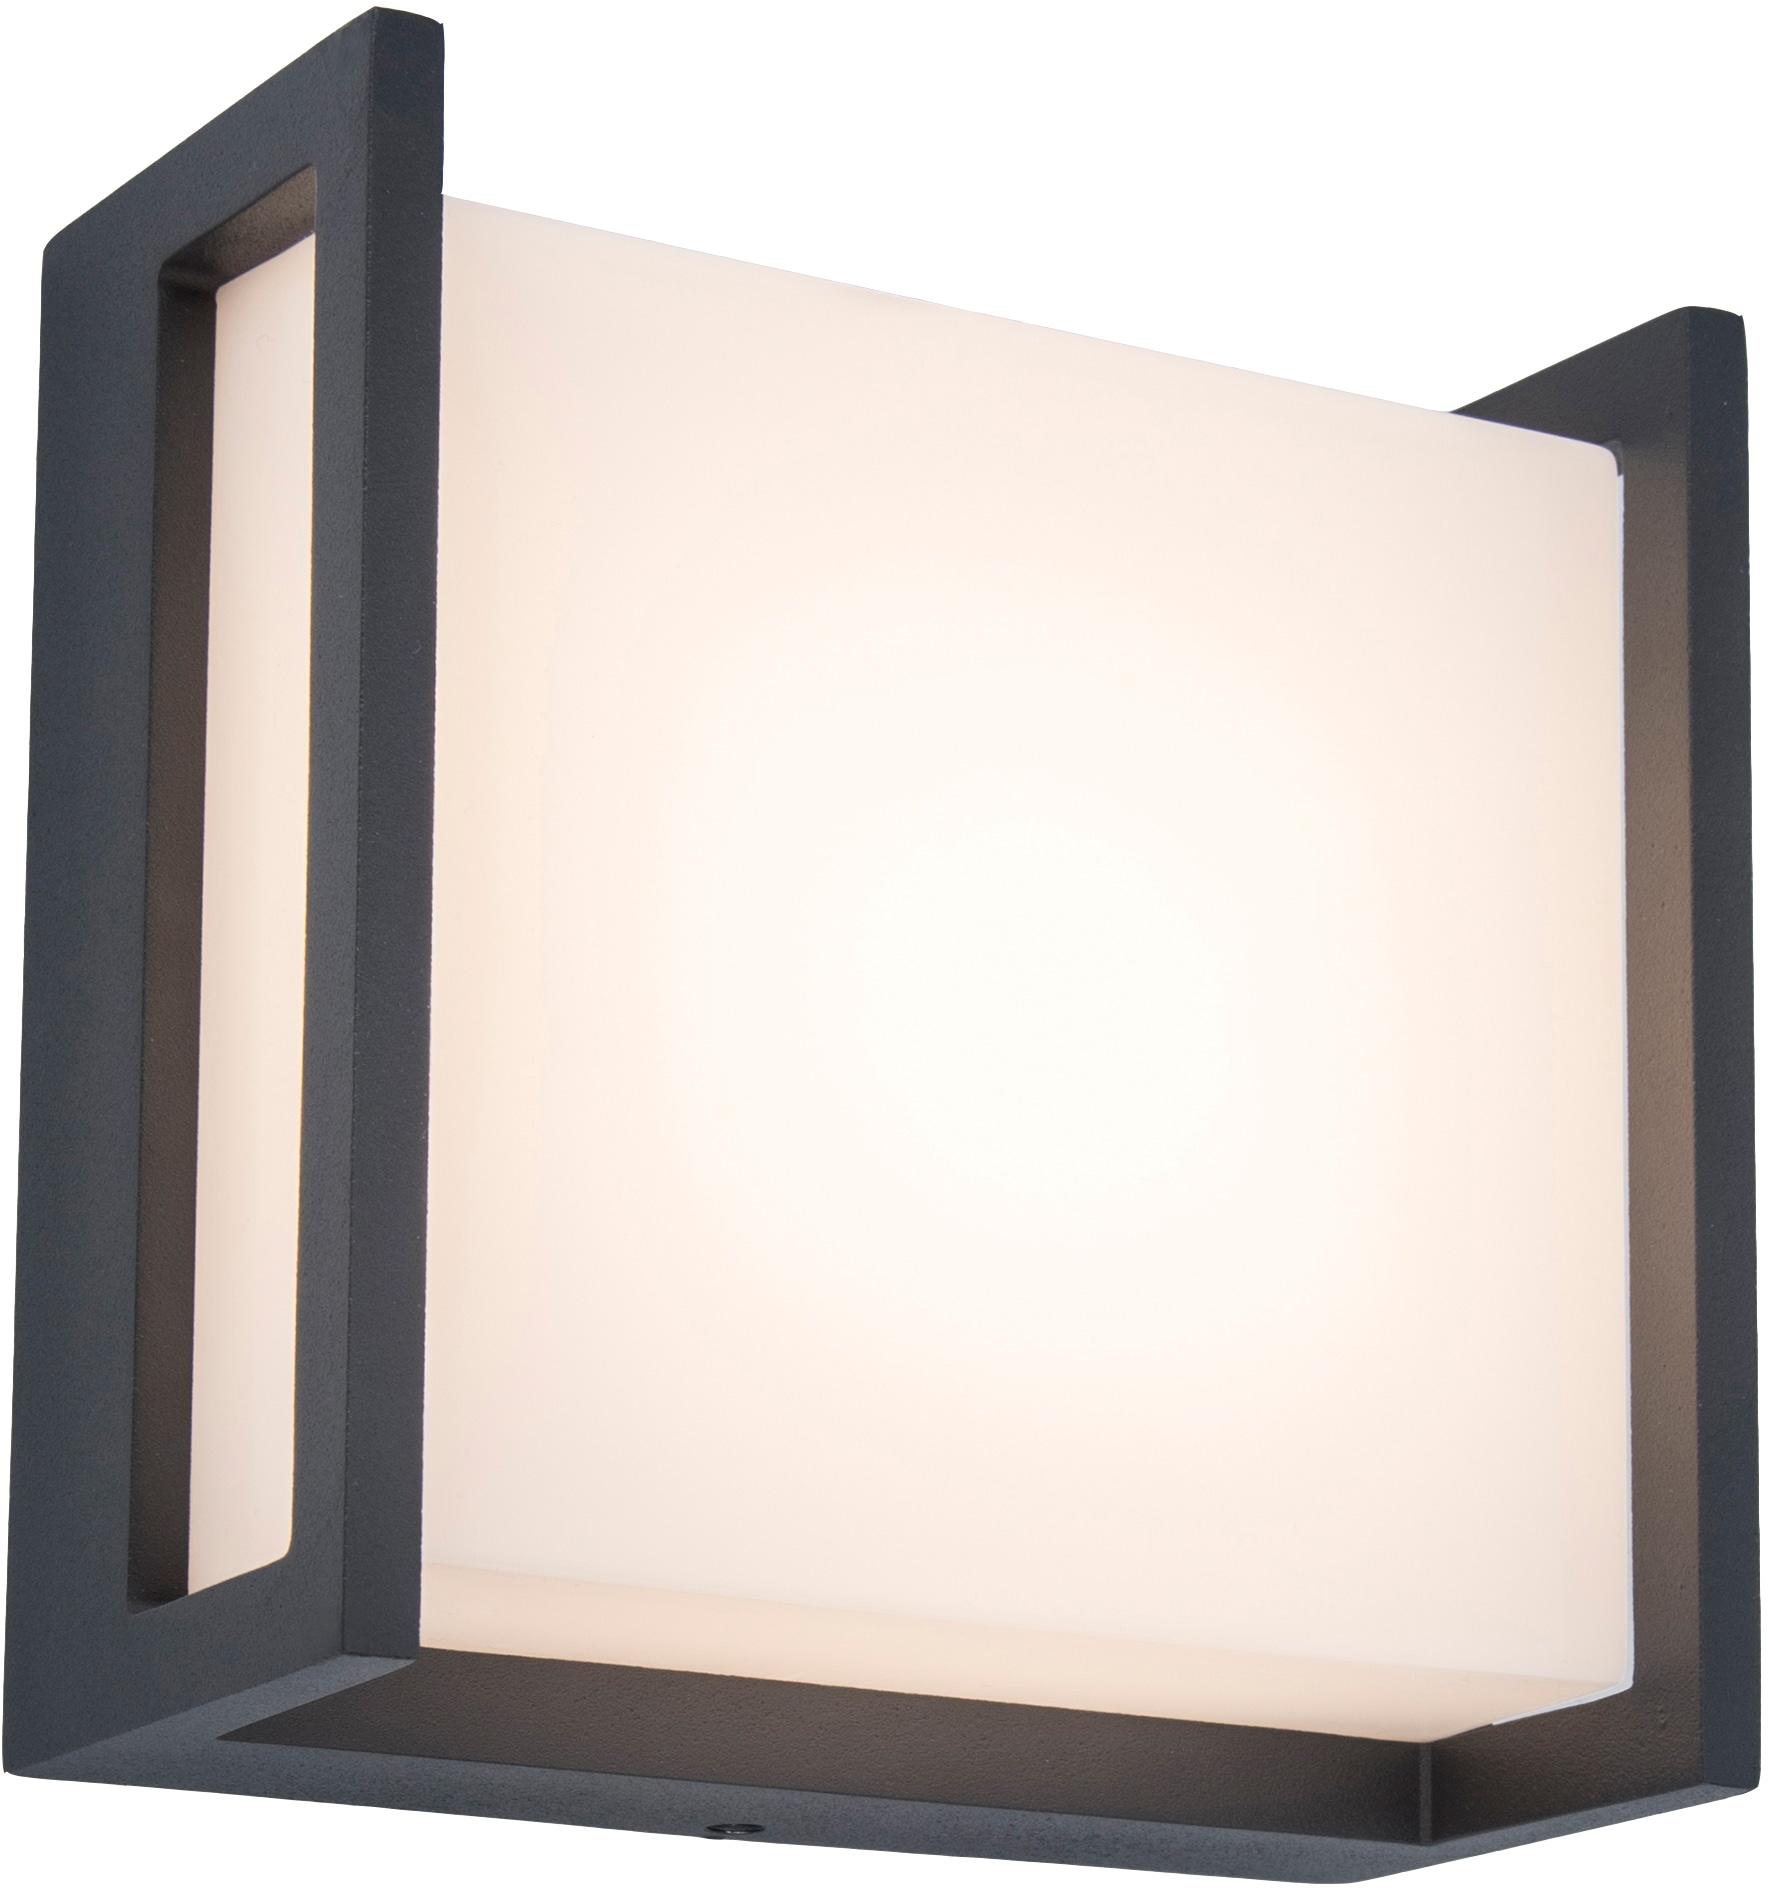 LUTEC LED Außen-Wandleuchte QUBO 5195401118, LED-Modul, 1 St., Warmweiß